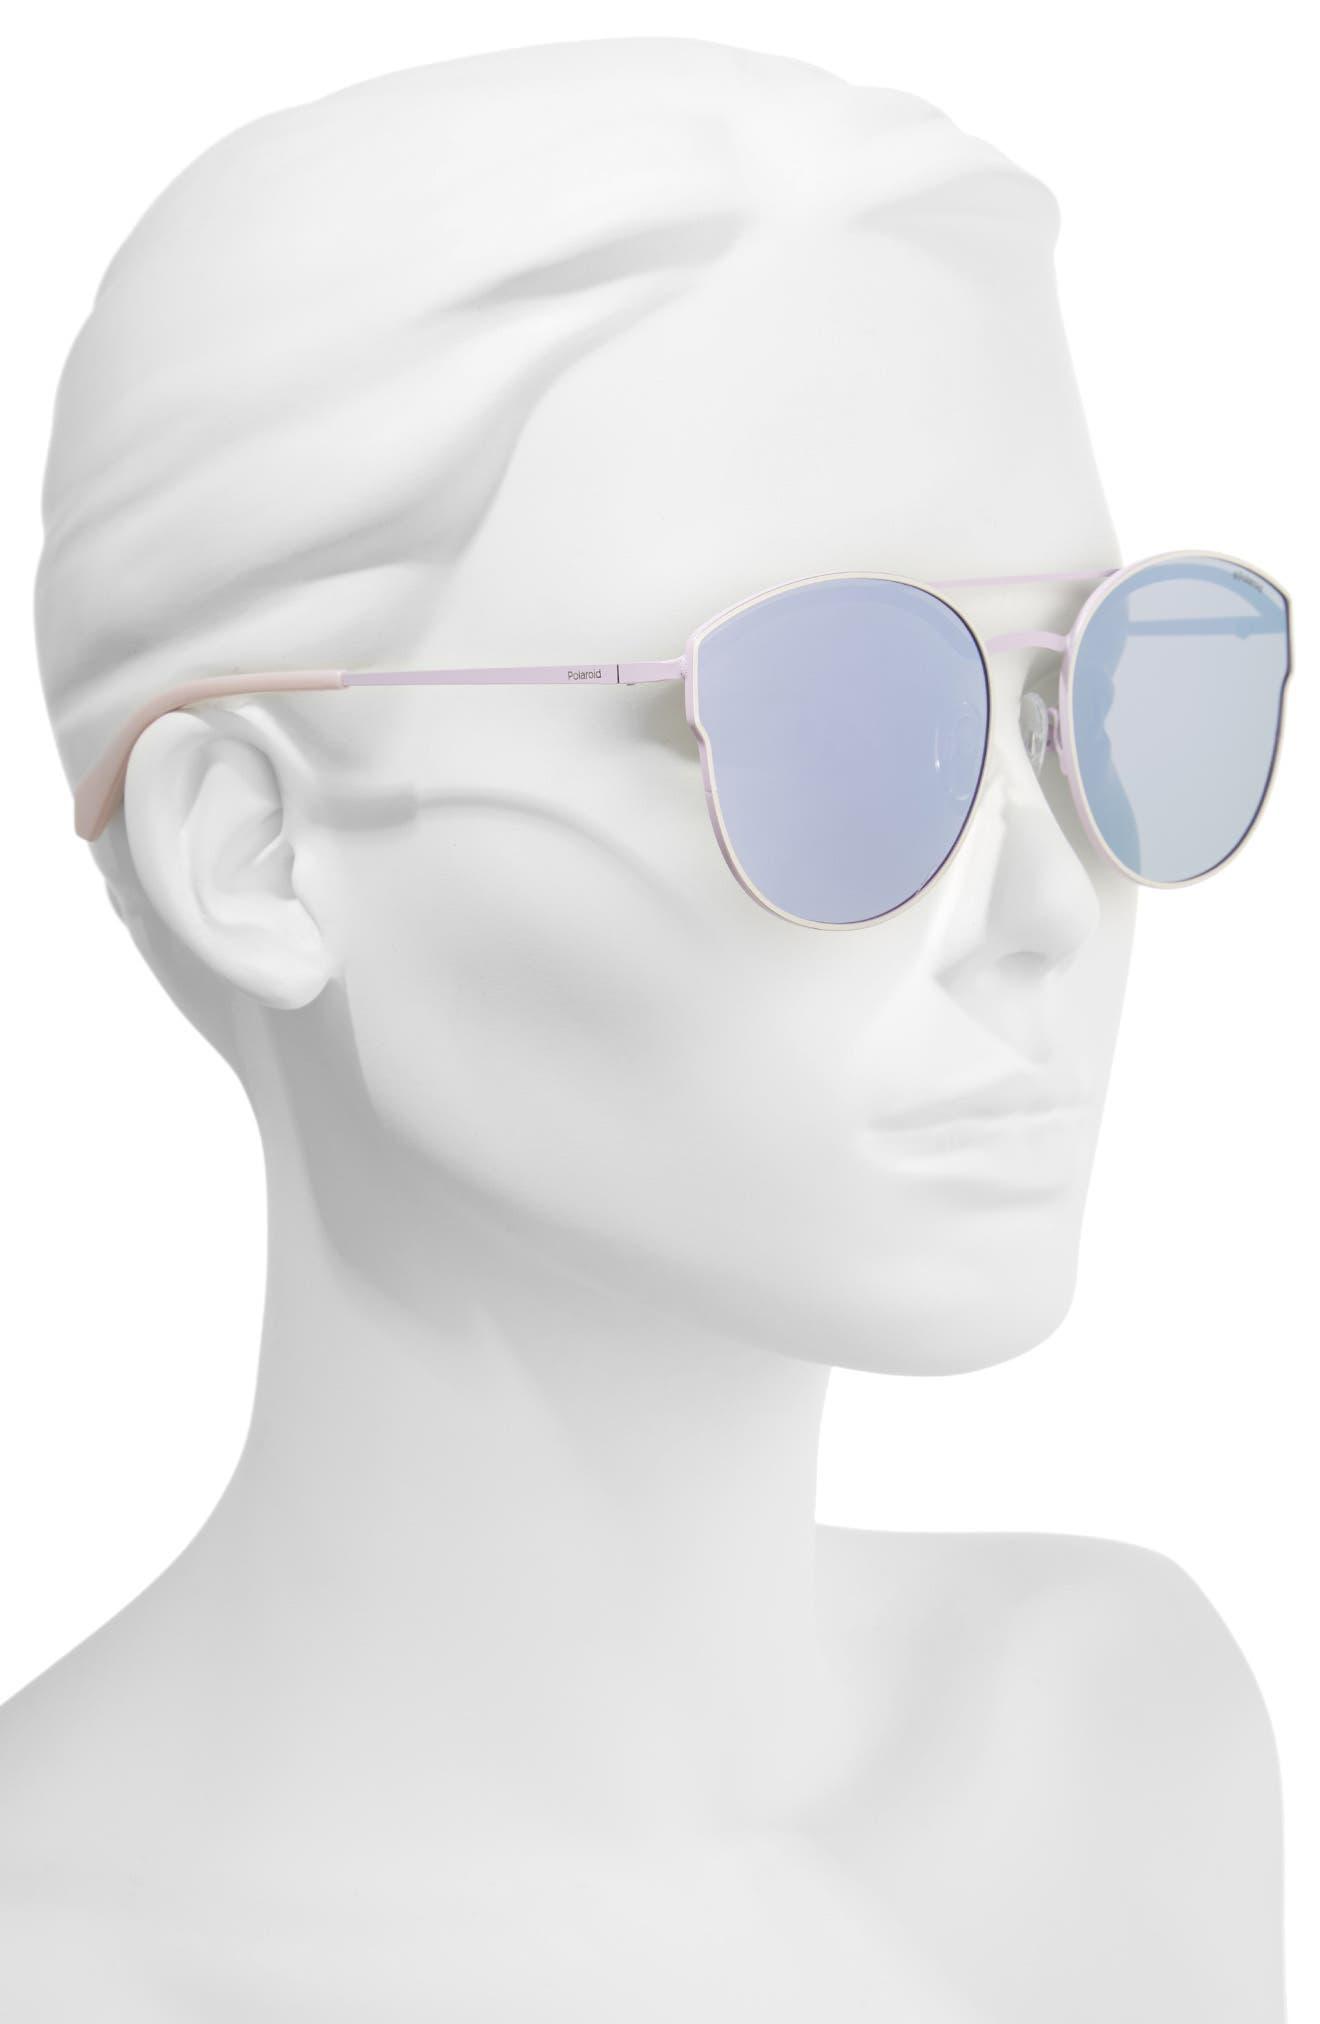 60mm Polarized Round Aviator Sunglasses,                             Alternate thumbnail 3, color,                             Light Gold